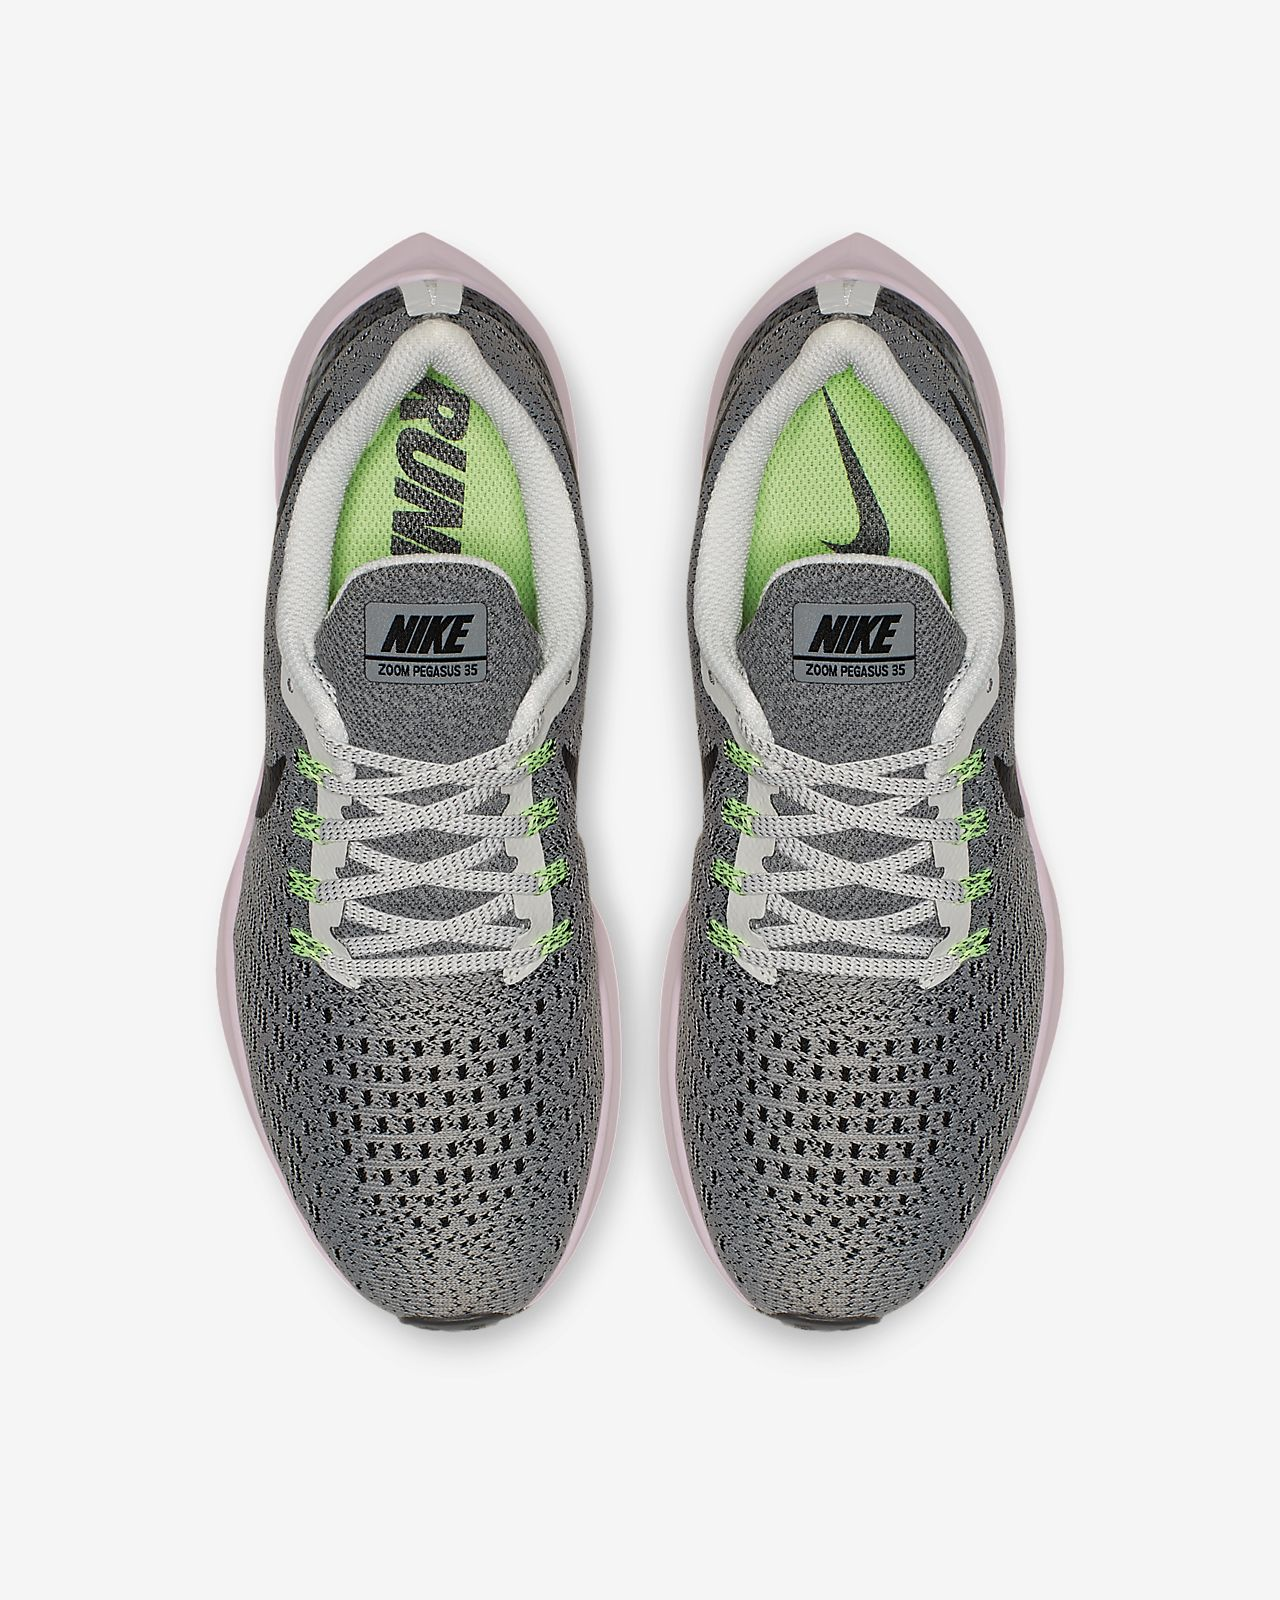 892cc3433e43 Nike Air Zoom Pegasus 35 Women s Running Shoe. Nike.com GB